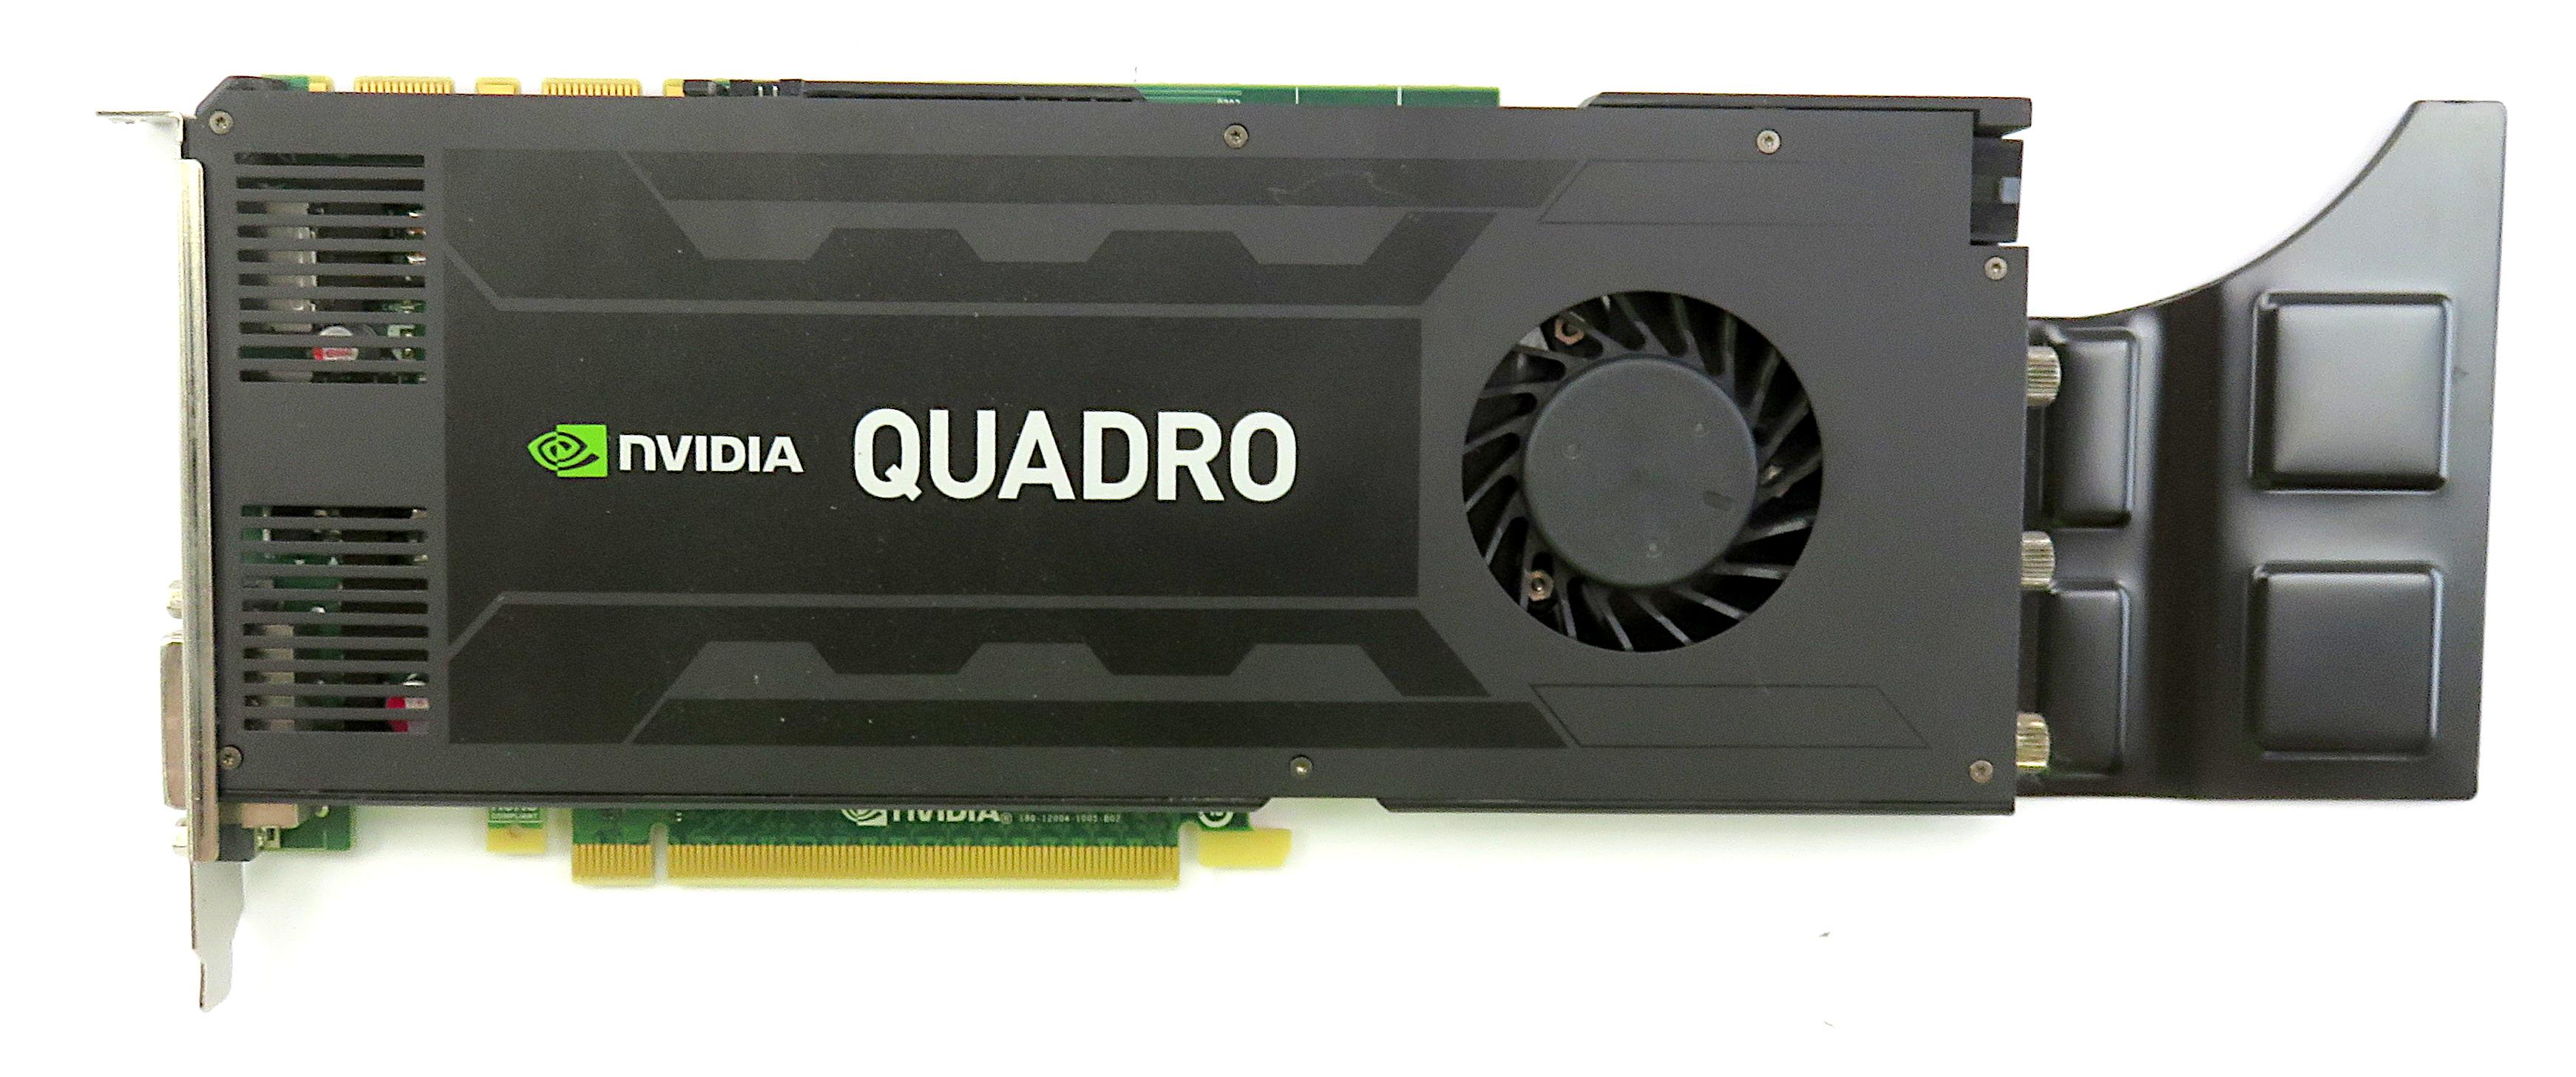 Dell 0J4F85 Nvidia Quadro K4200 4GB GDDR5 PCIe Workstation Graphics Card